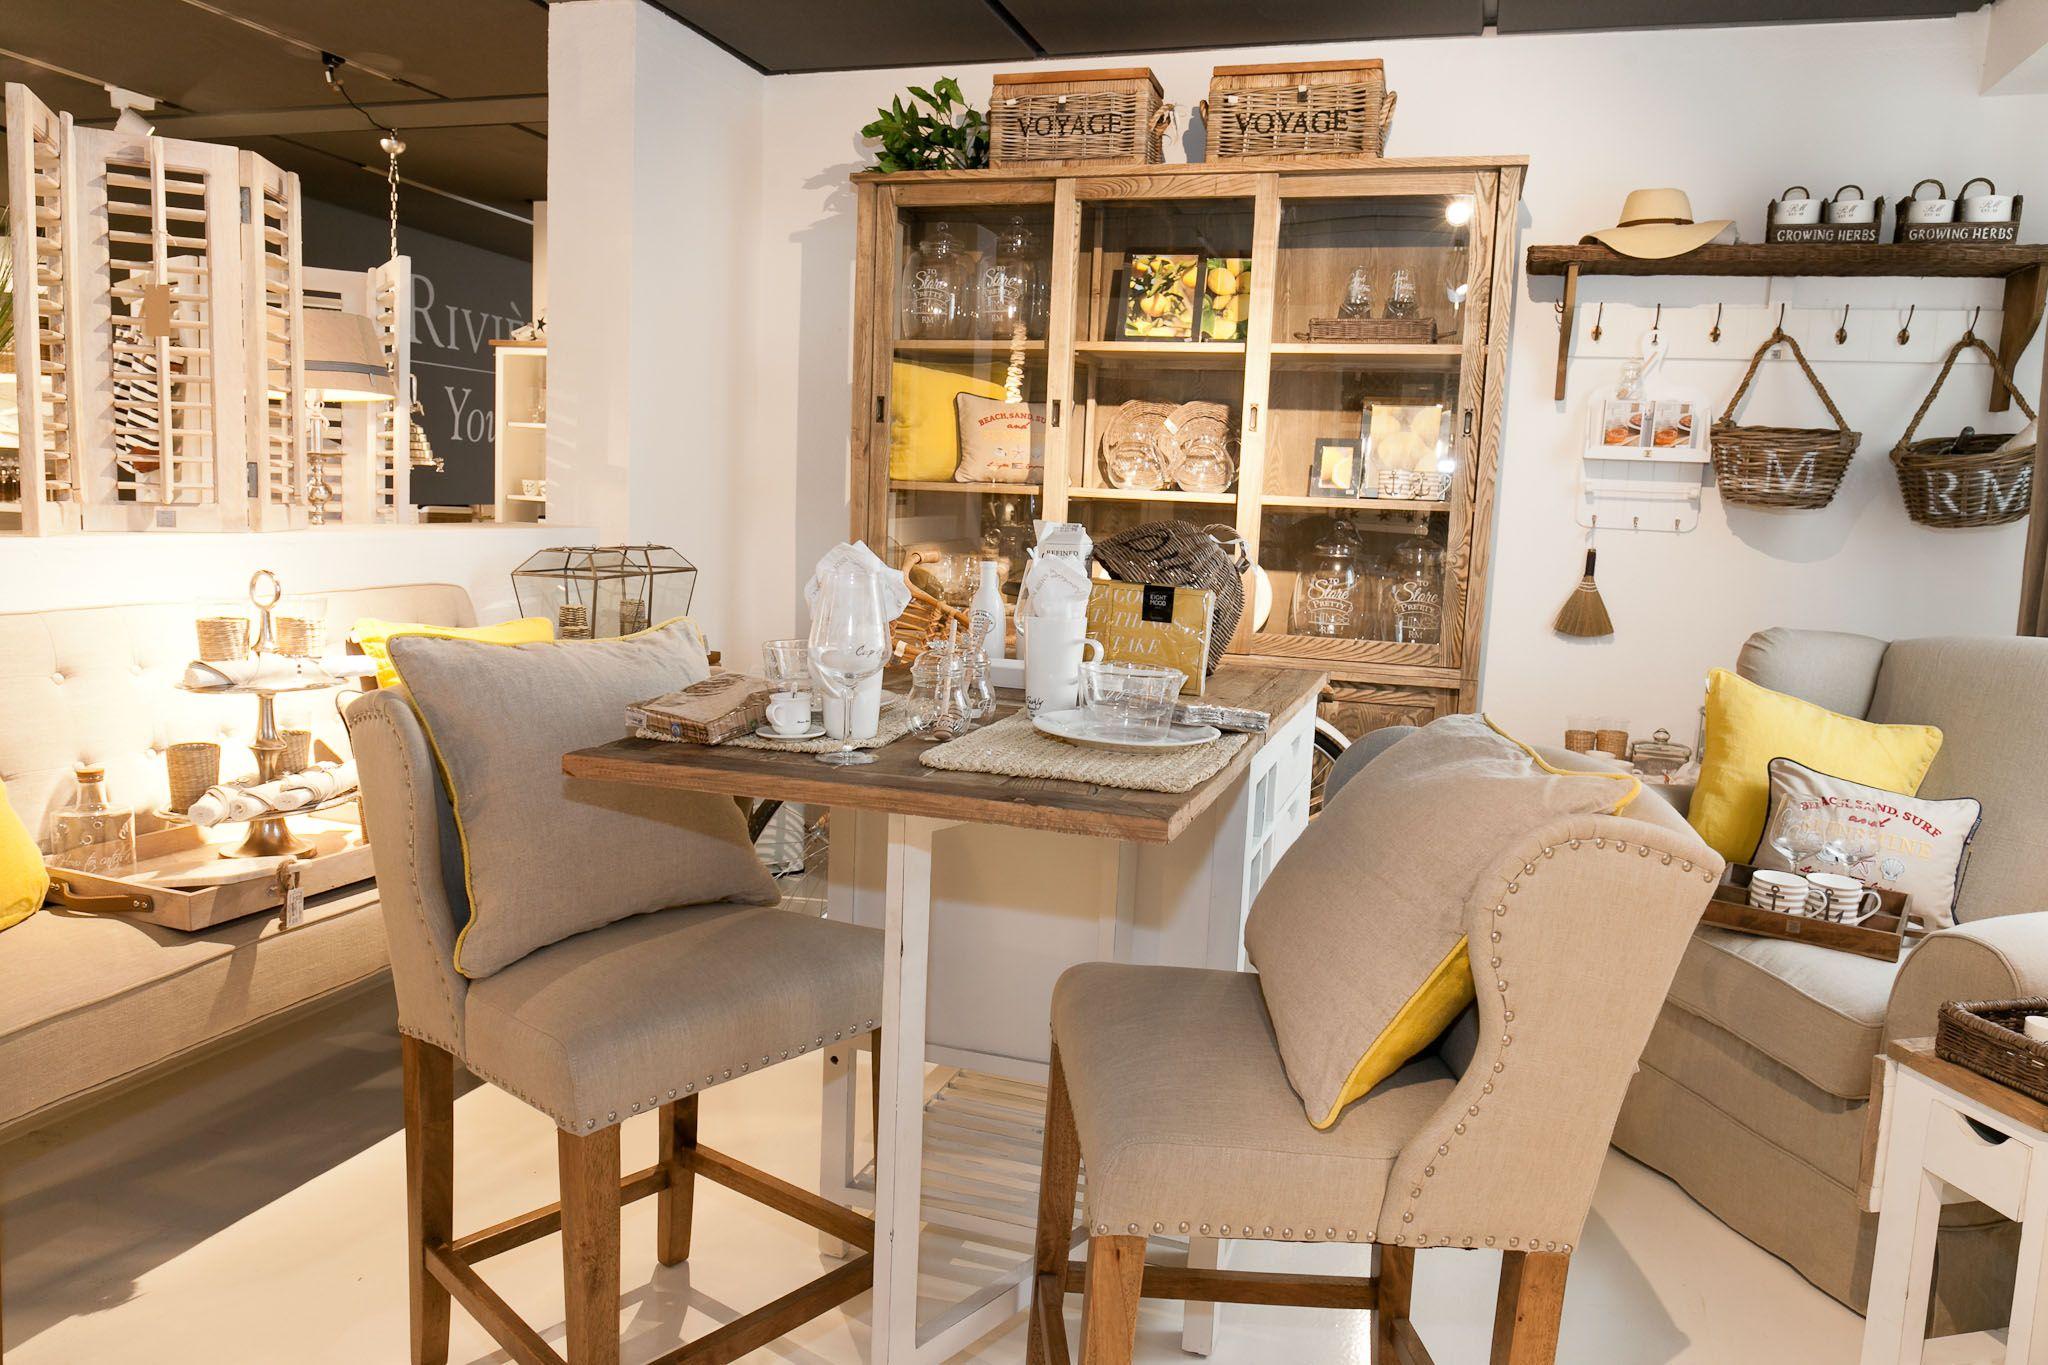 riviera maison showroom summer 2016 riviera maison. Black Bedroom Furniture Sets. Home Design Ideas